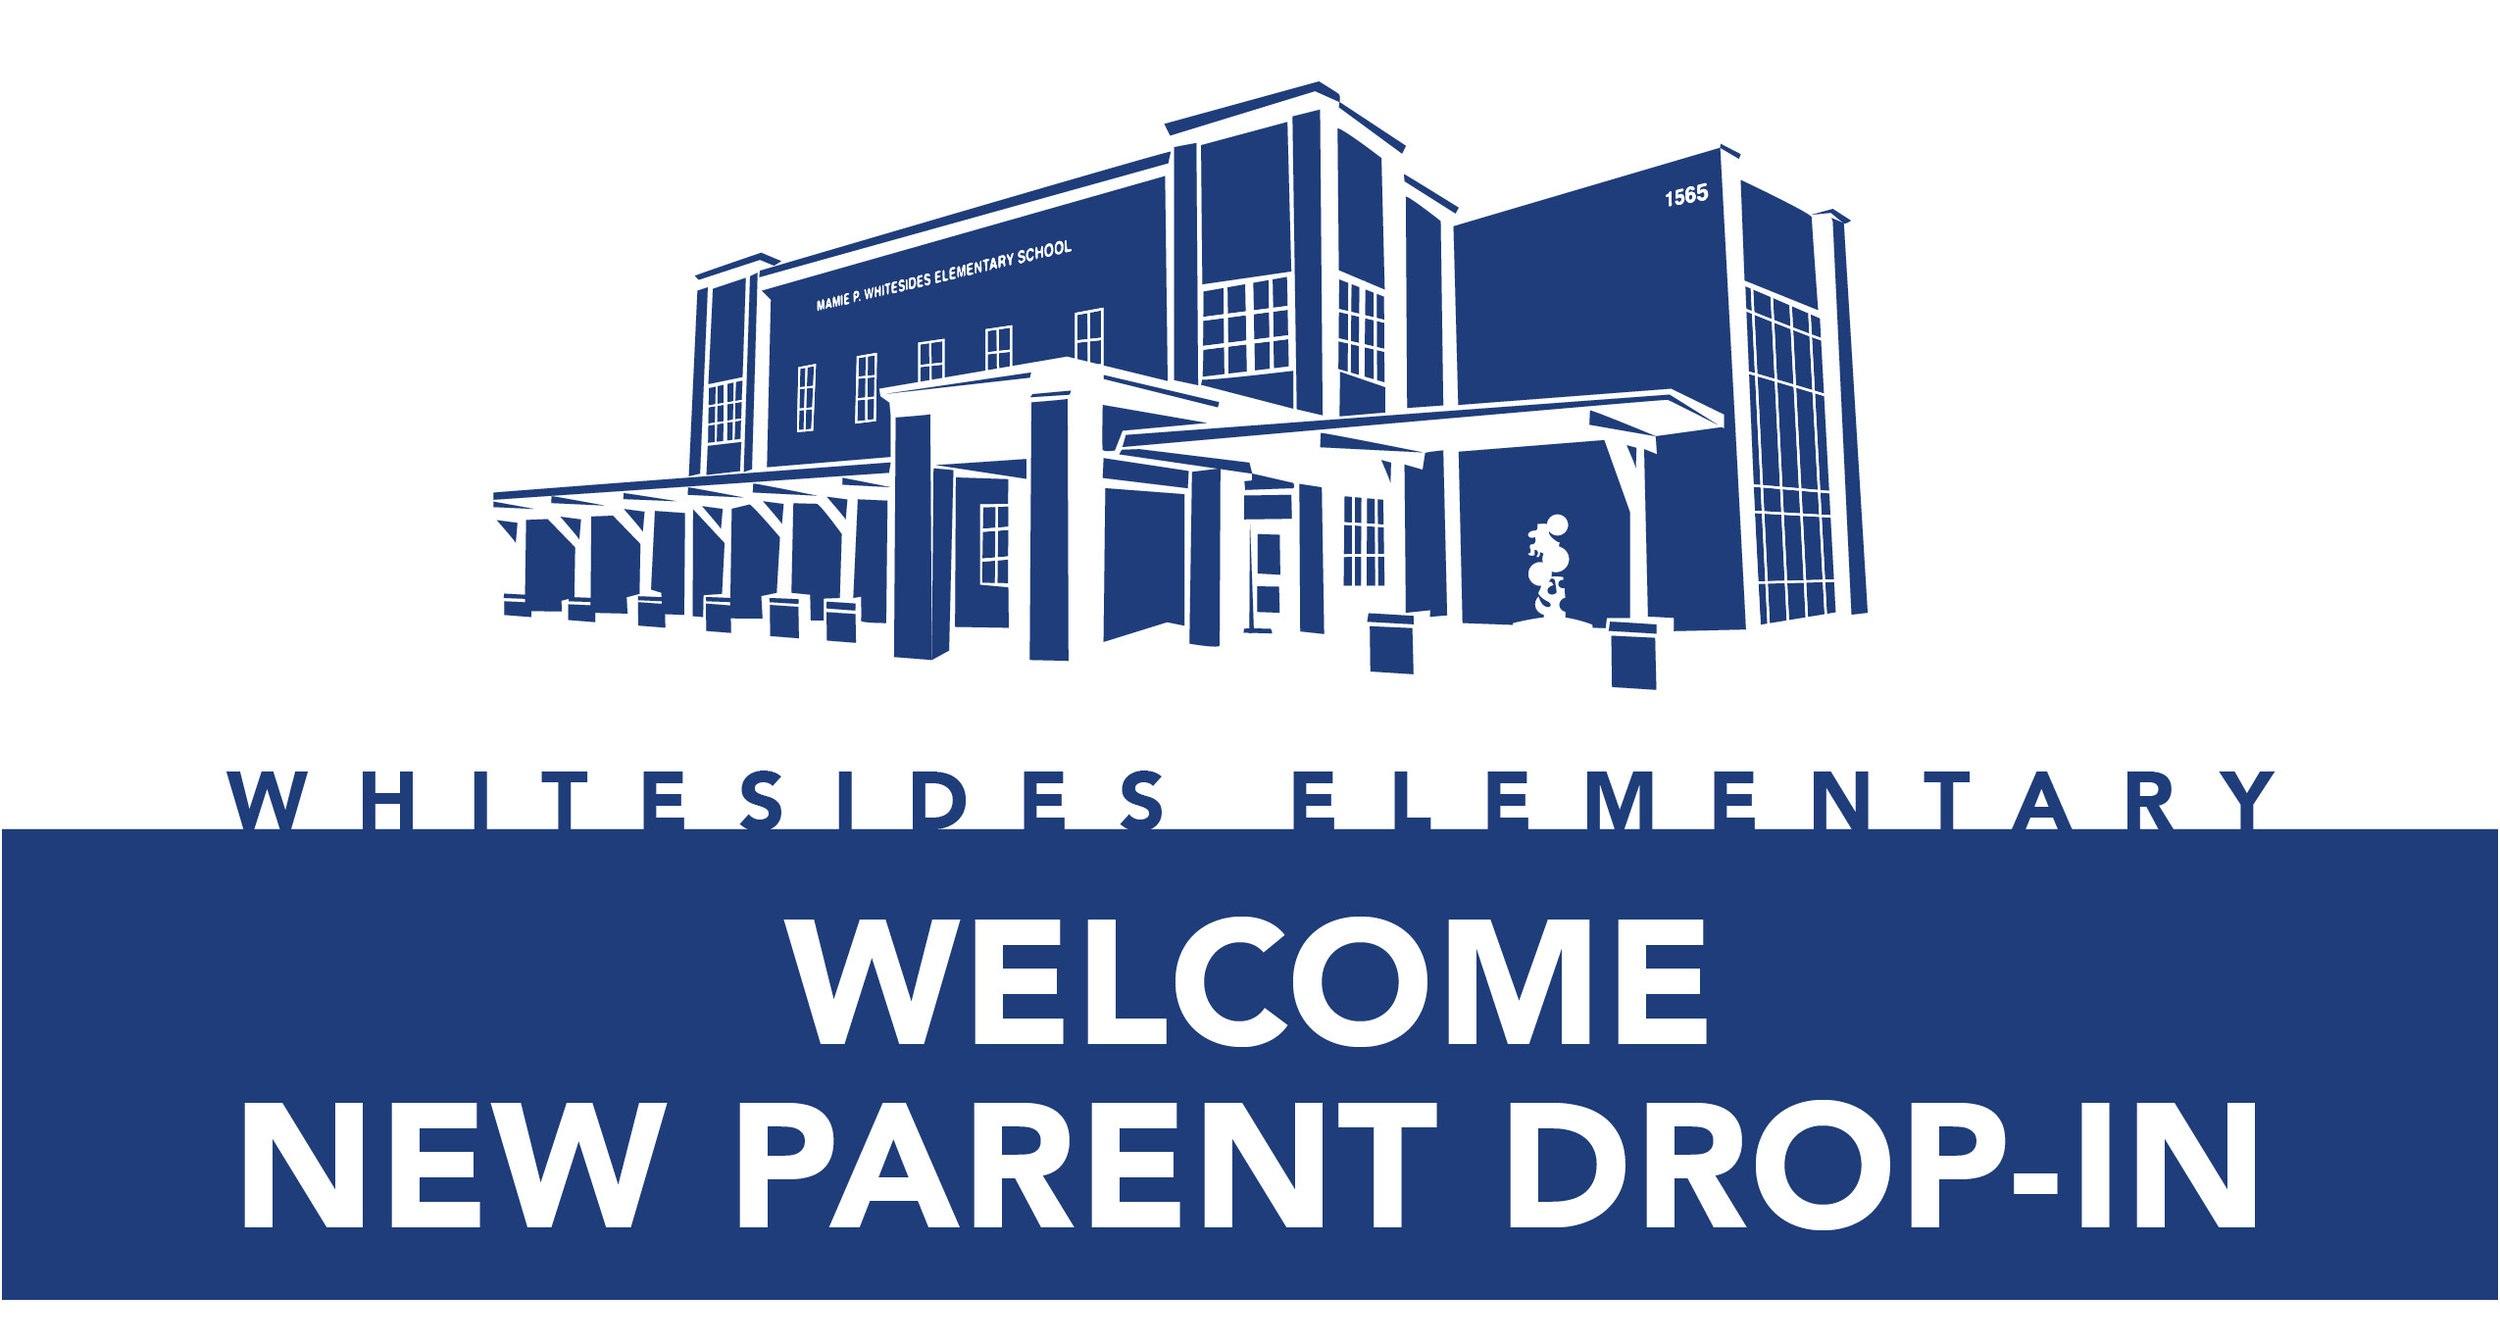 WelcomeNewParentDropIn-Flyer2019.jpg